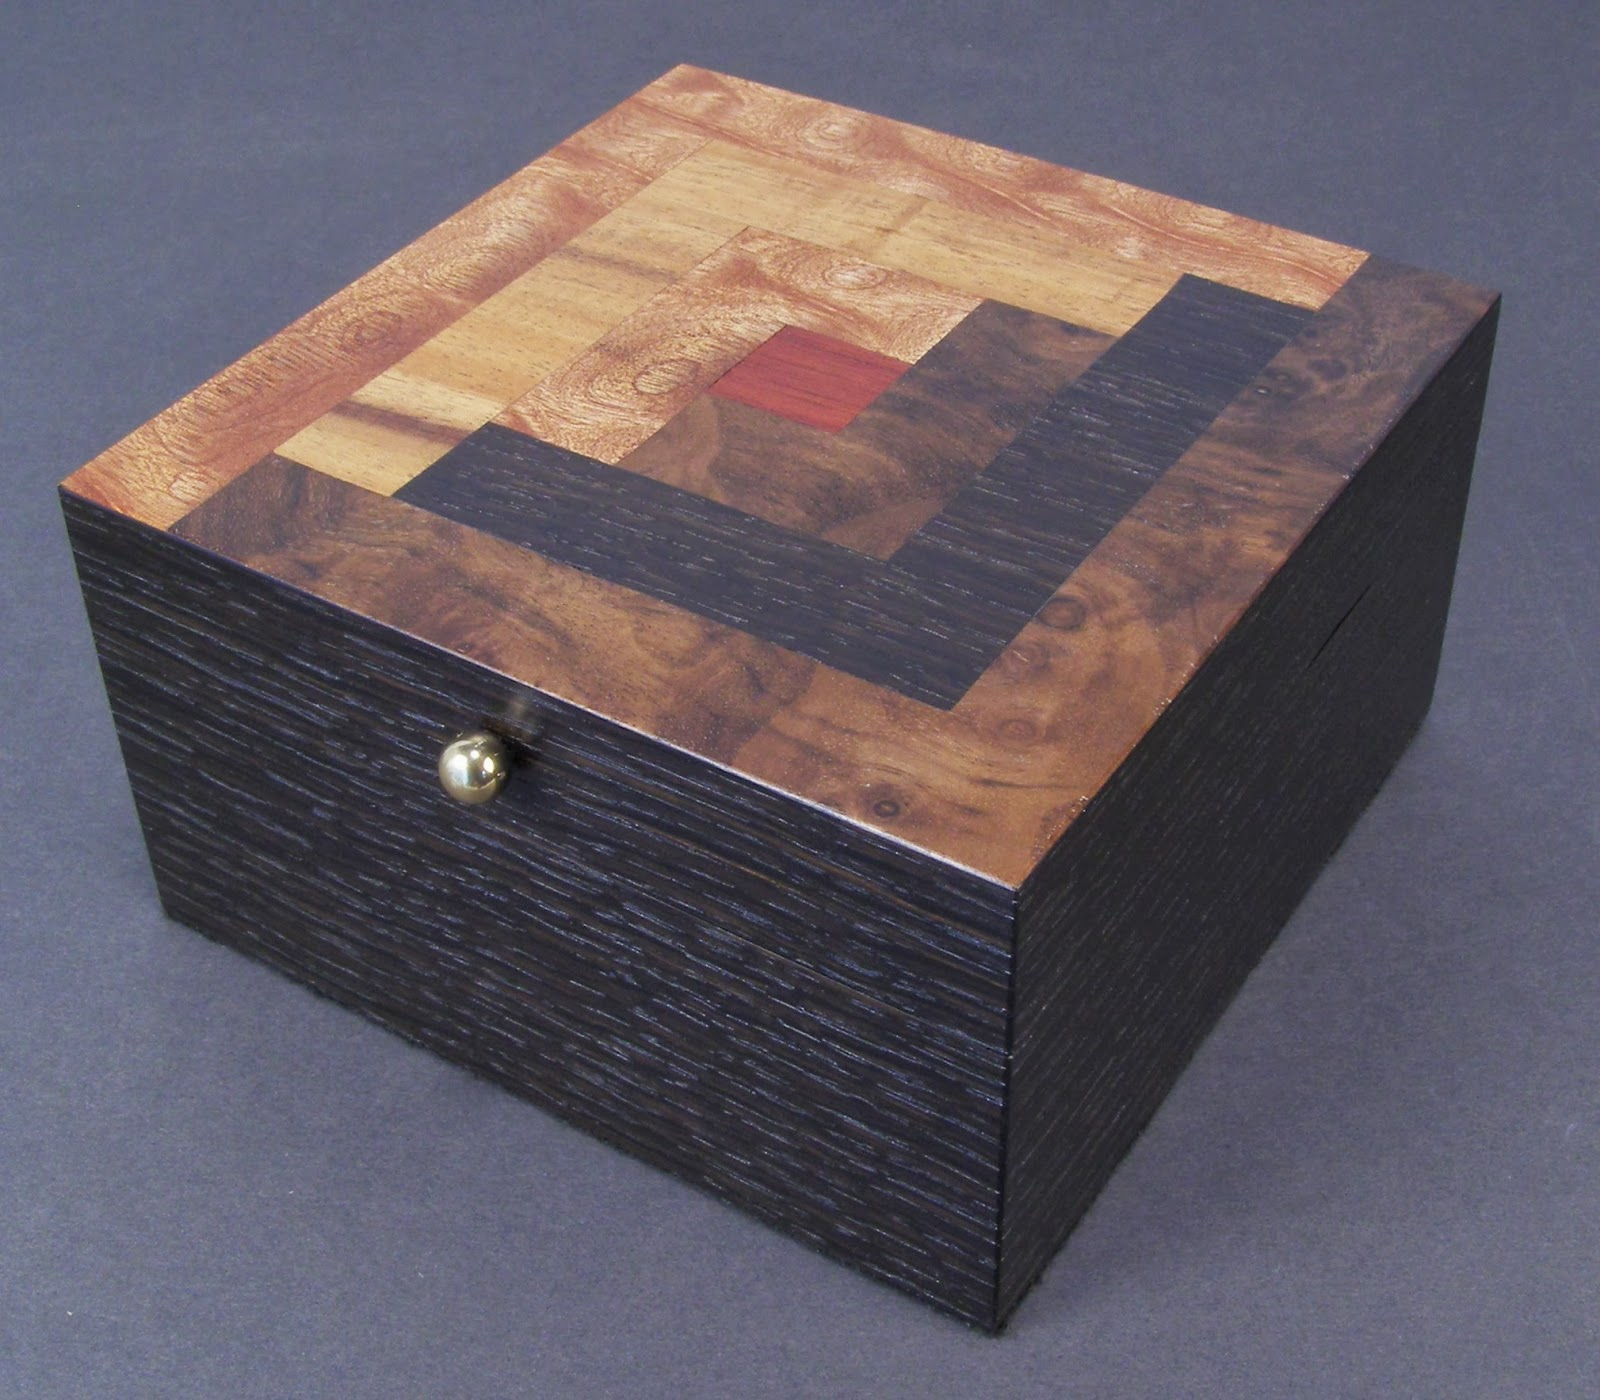 Decorative Keepsake Box: Quiltboxes: Decorative Keepsake Boxes